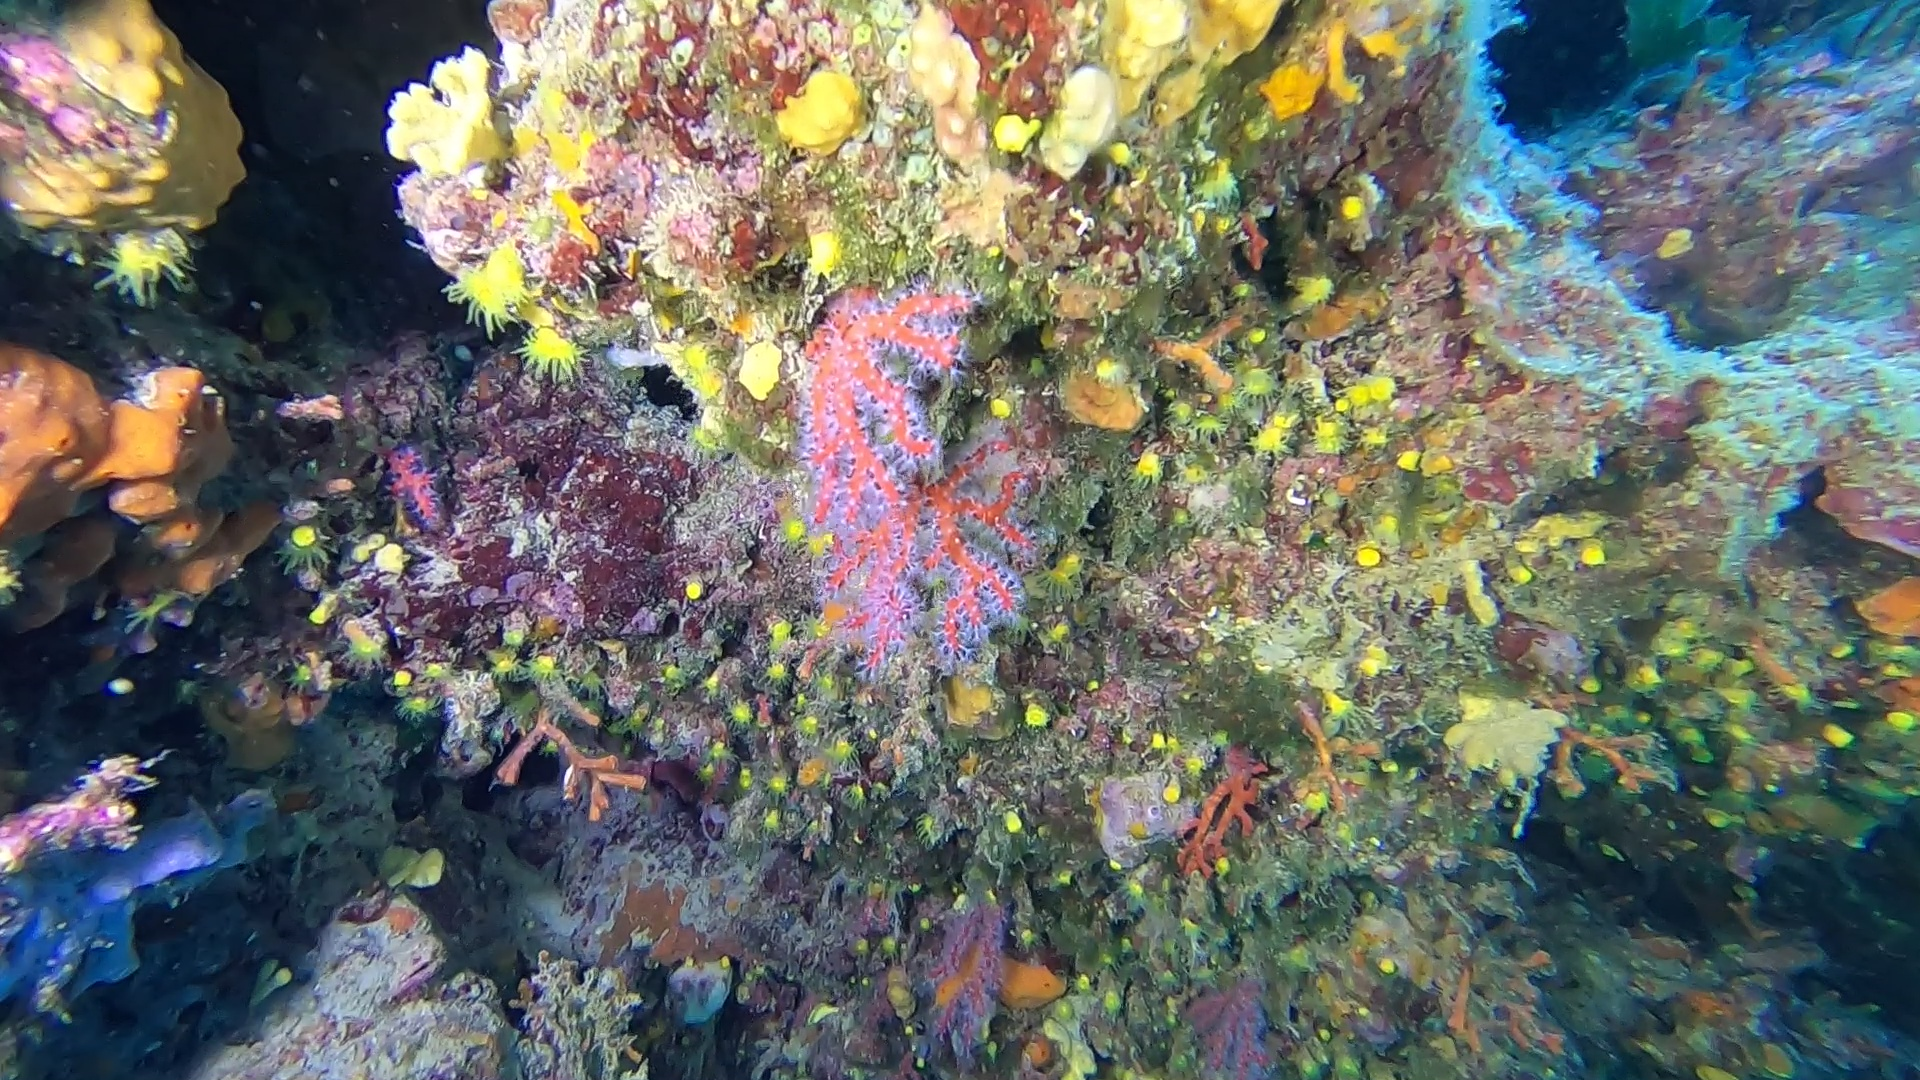 Corallo rosso Corallium rubrum Precious coral Red Coral intotheblue.it